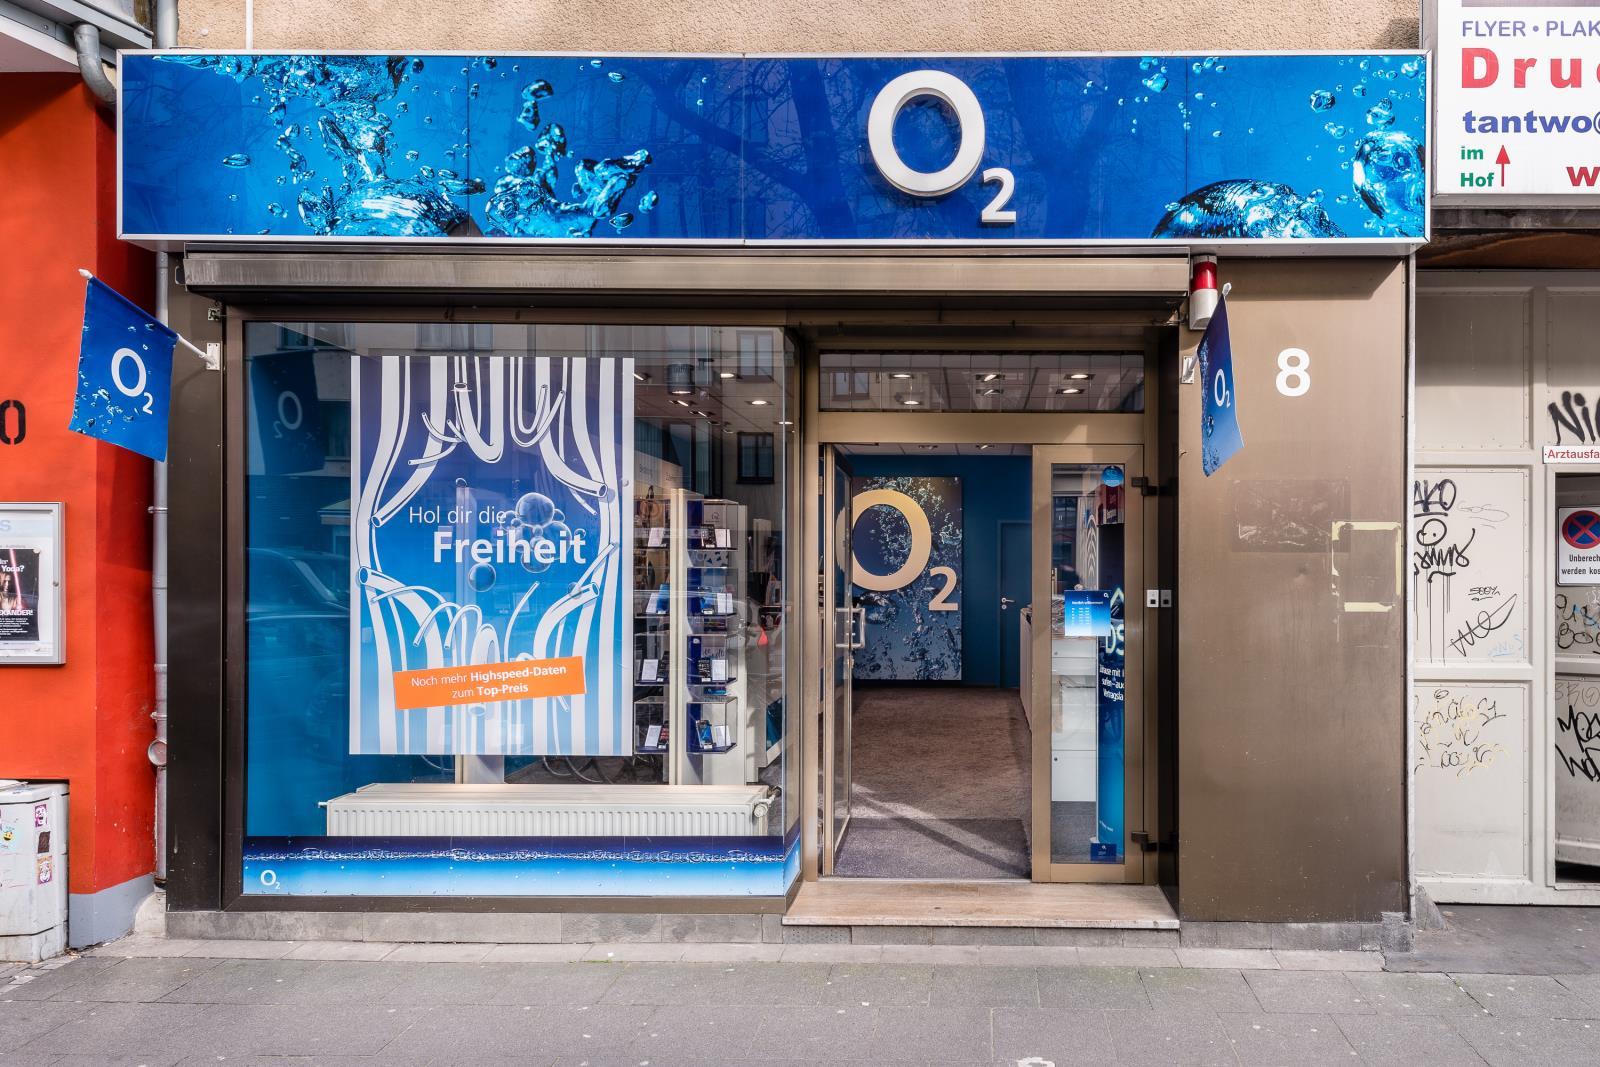 o2 Shop, Neusser Str. 8 in Köln